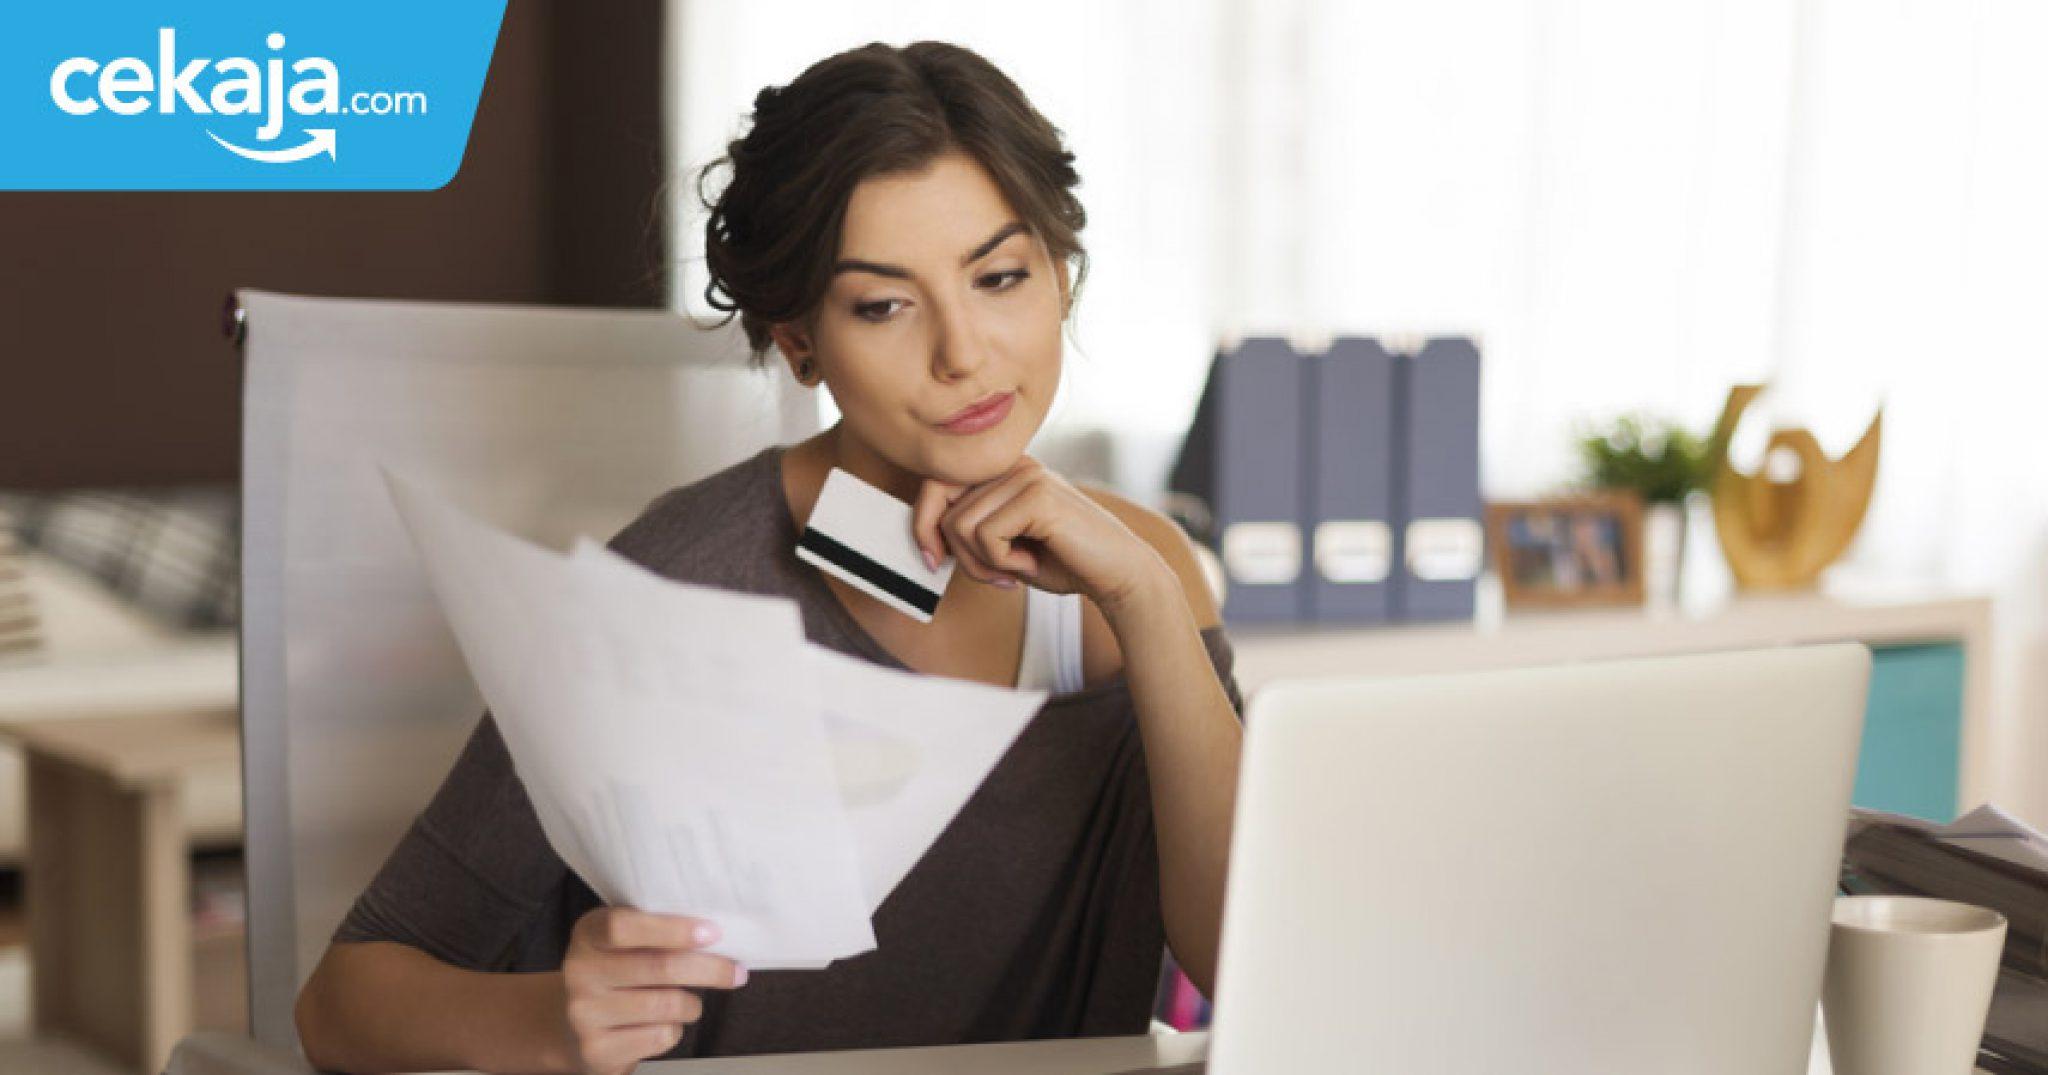 takut miliki kartu kredit _ kartu kredit - CekAja.com